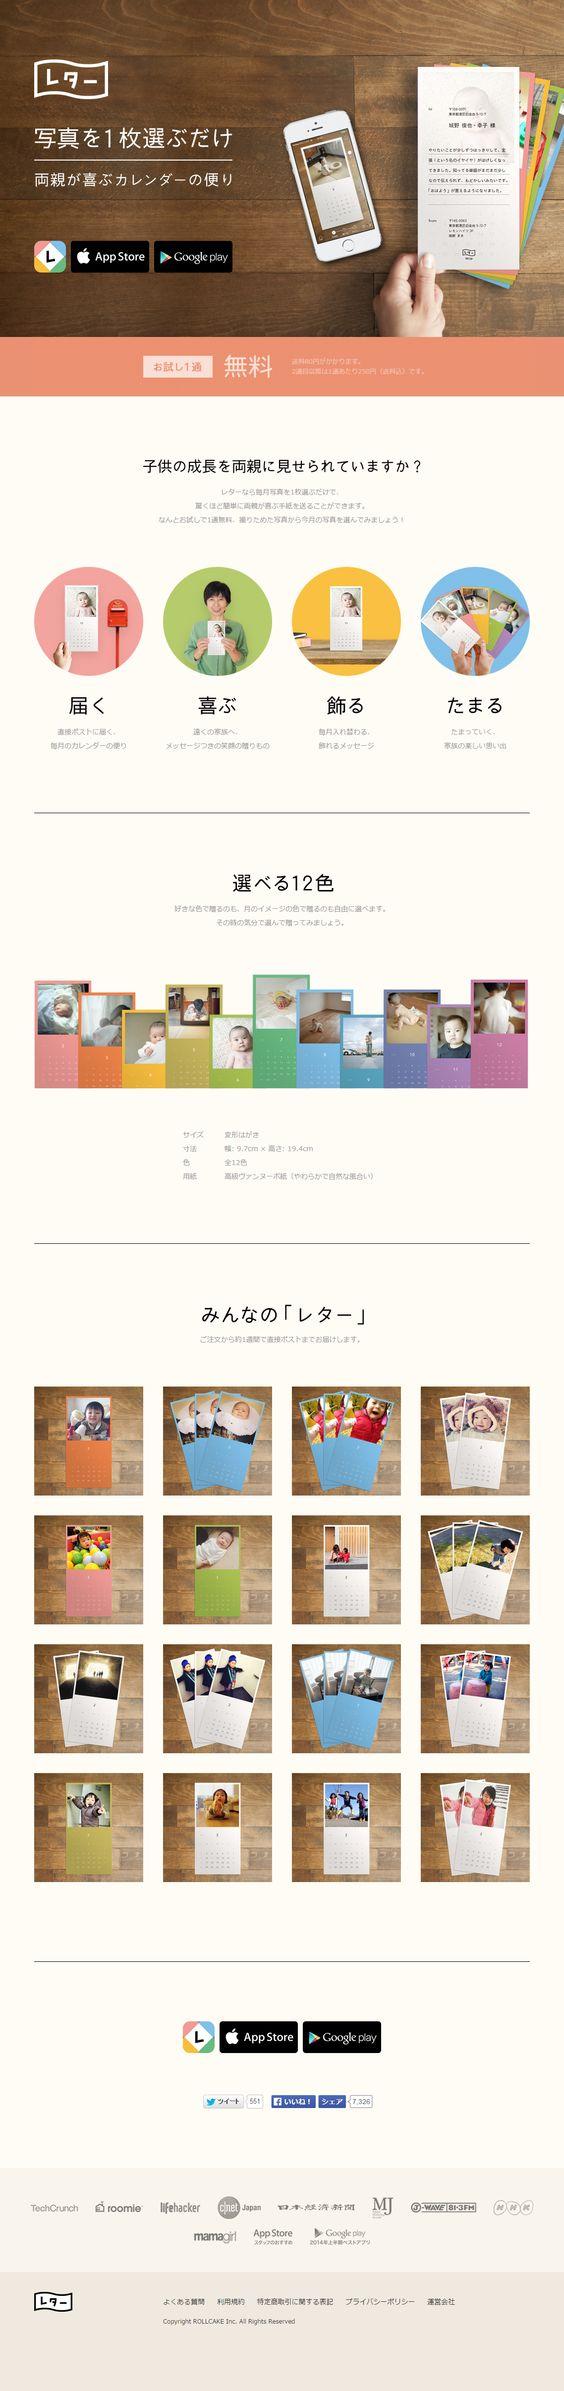 L_screencapture-lttr-jp